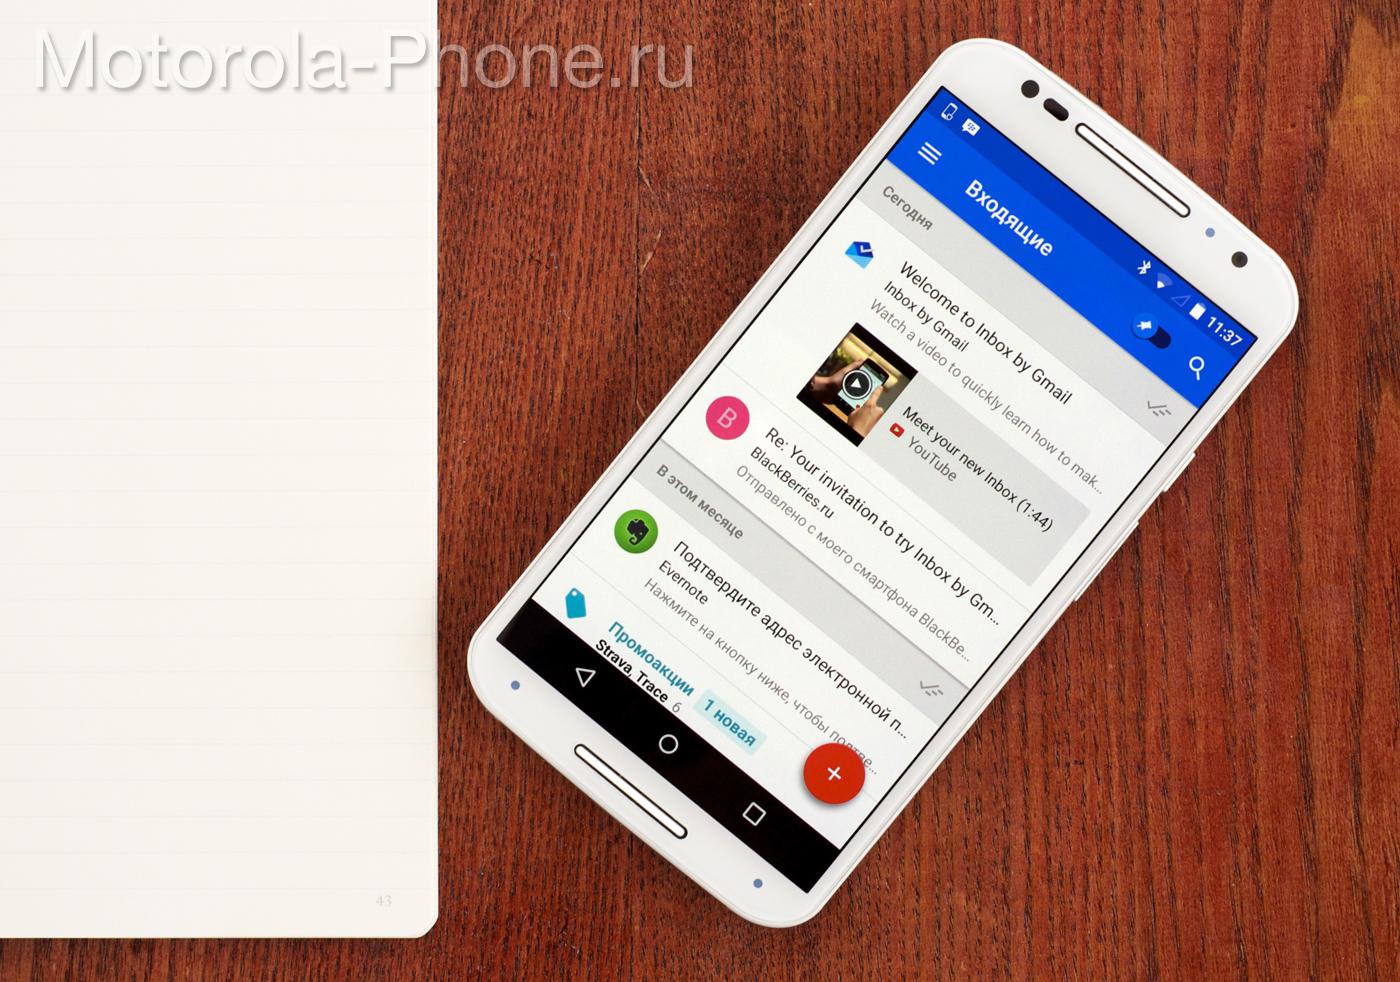 Motorola-Moto-X-Inbox-03